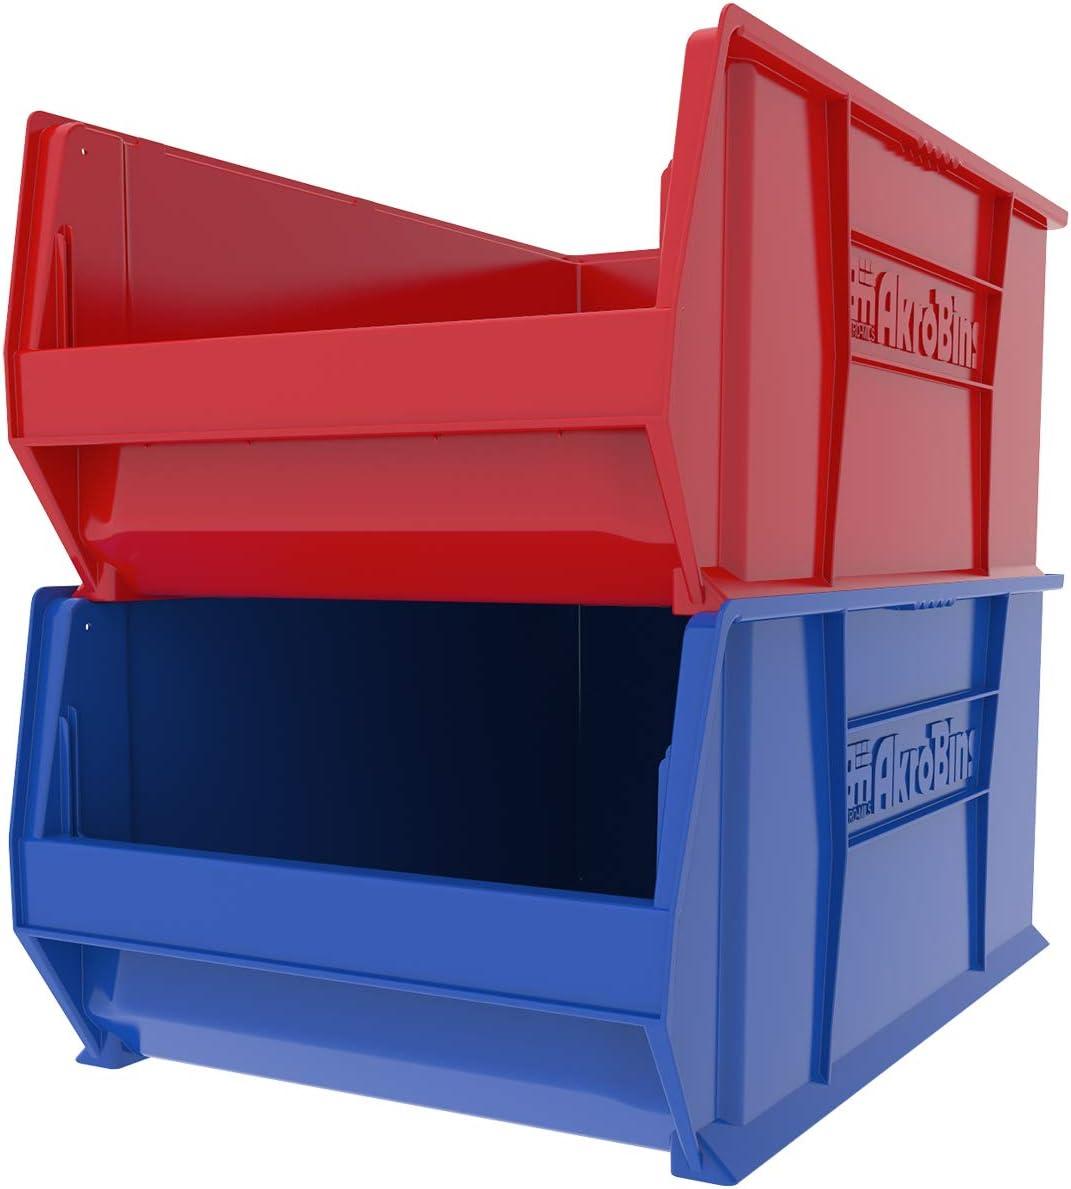 Akro-Mils 30290 29-Inch D by 18-Inch W by 12-Inch H Super Size Plastic Stacking Storage Akro Bin Blue